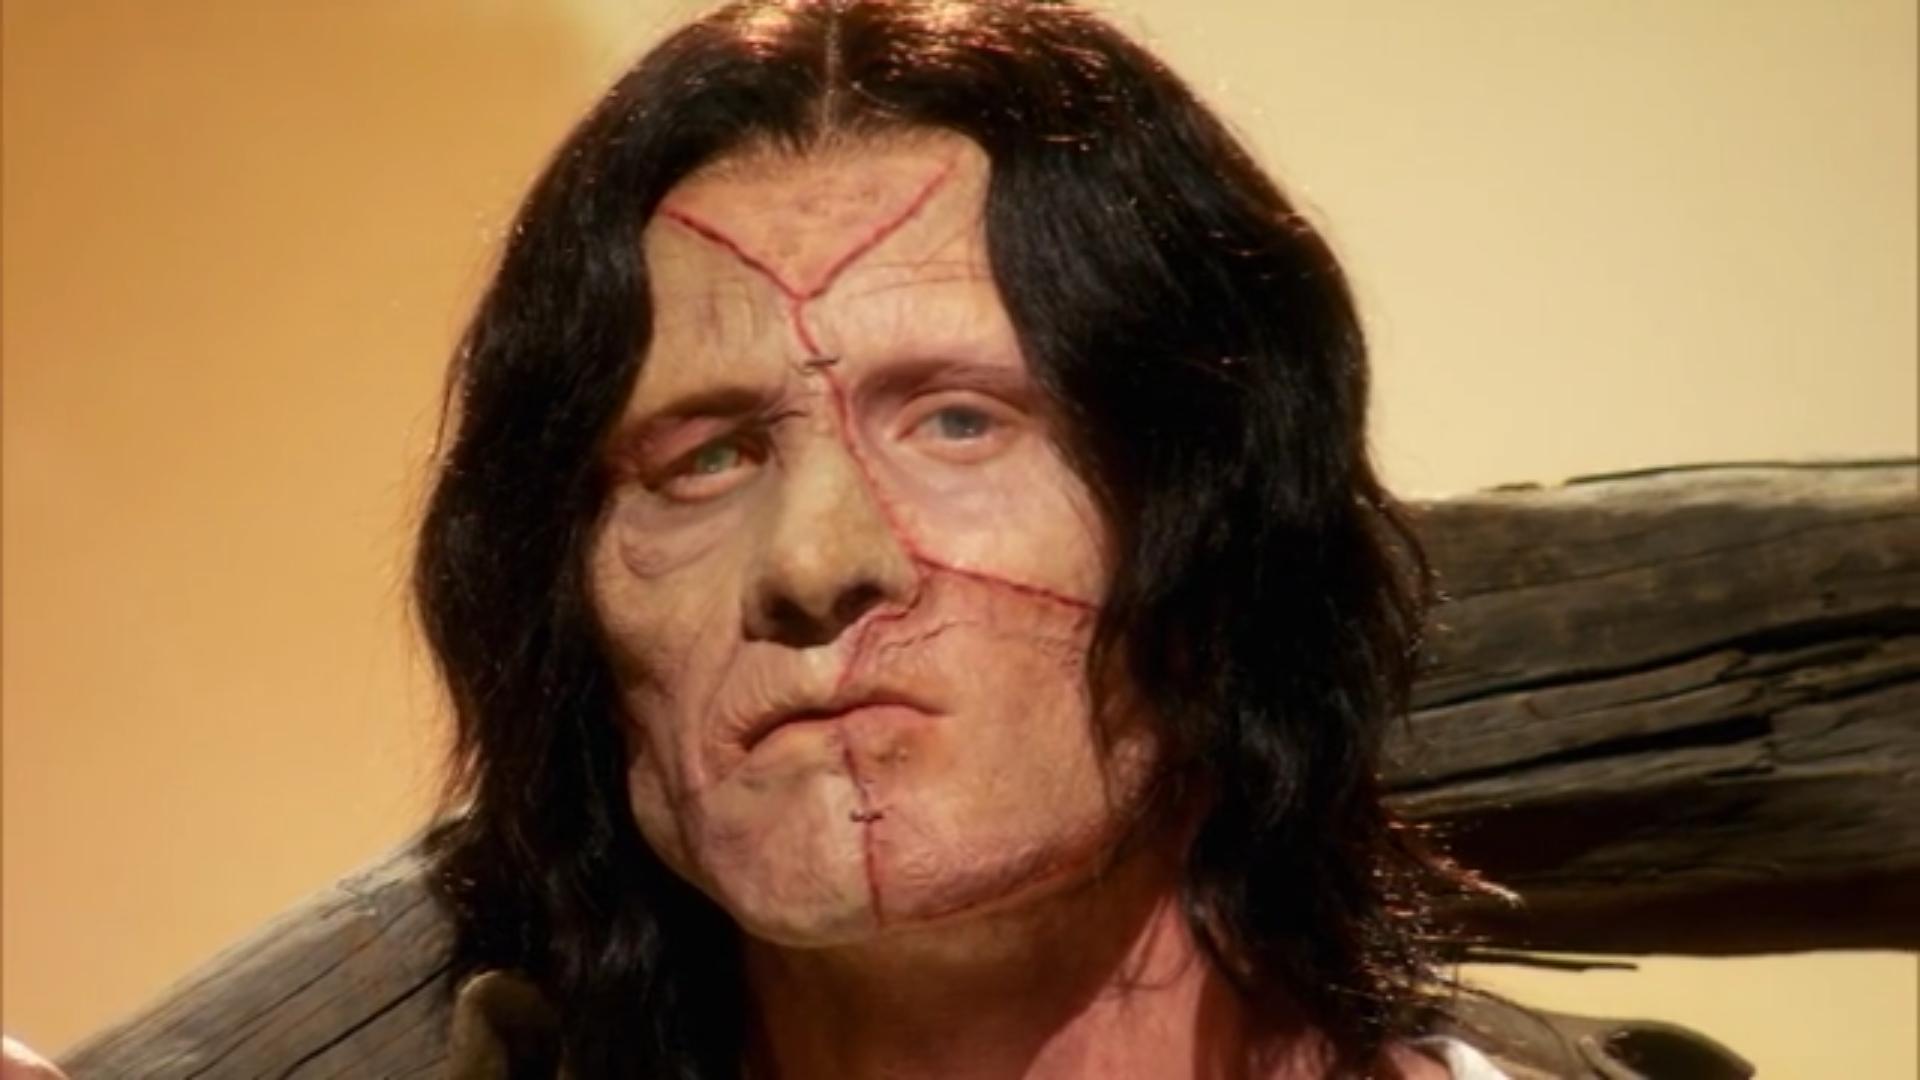 A close look at Scott Fensterer's finished makeup